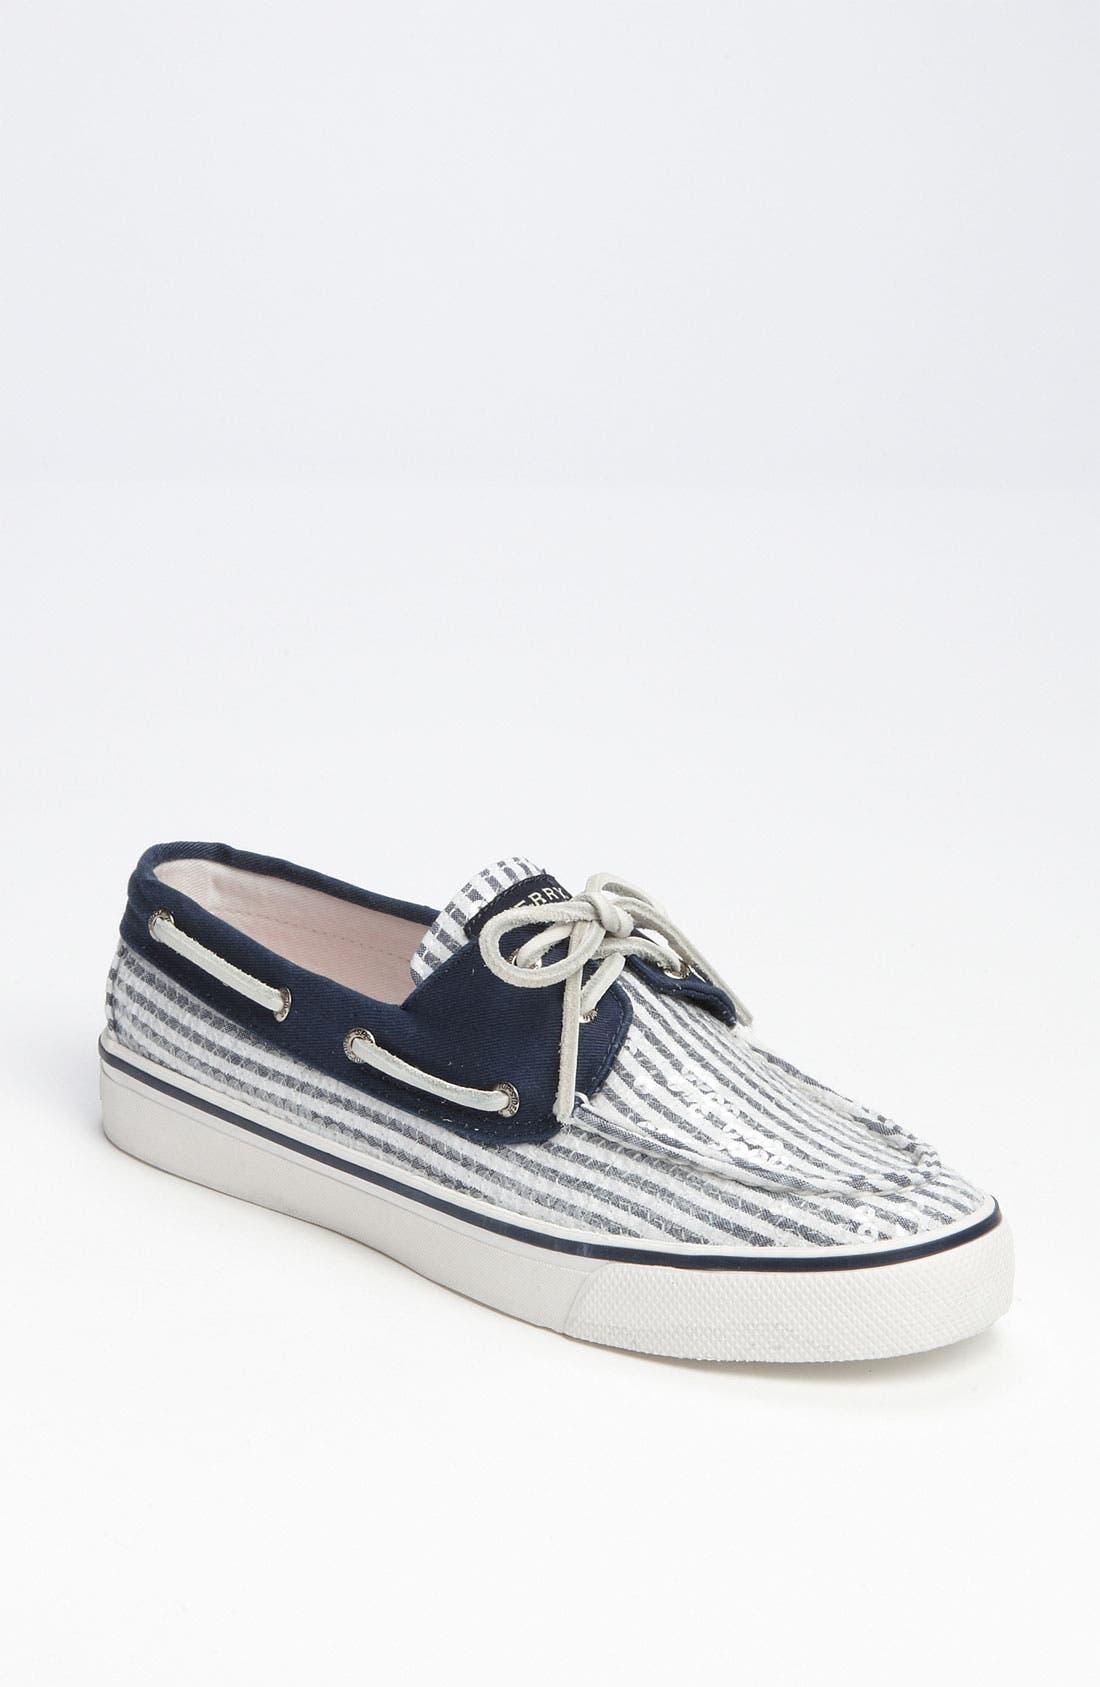 Main Image - Sperry 'Bahama' Sneaker (Women)